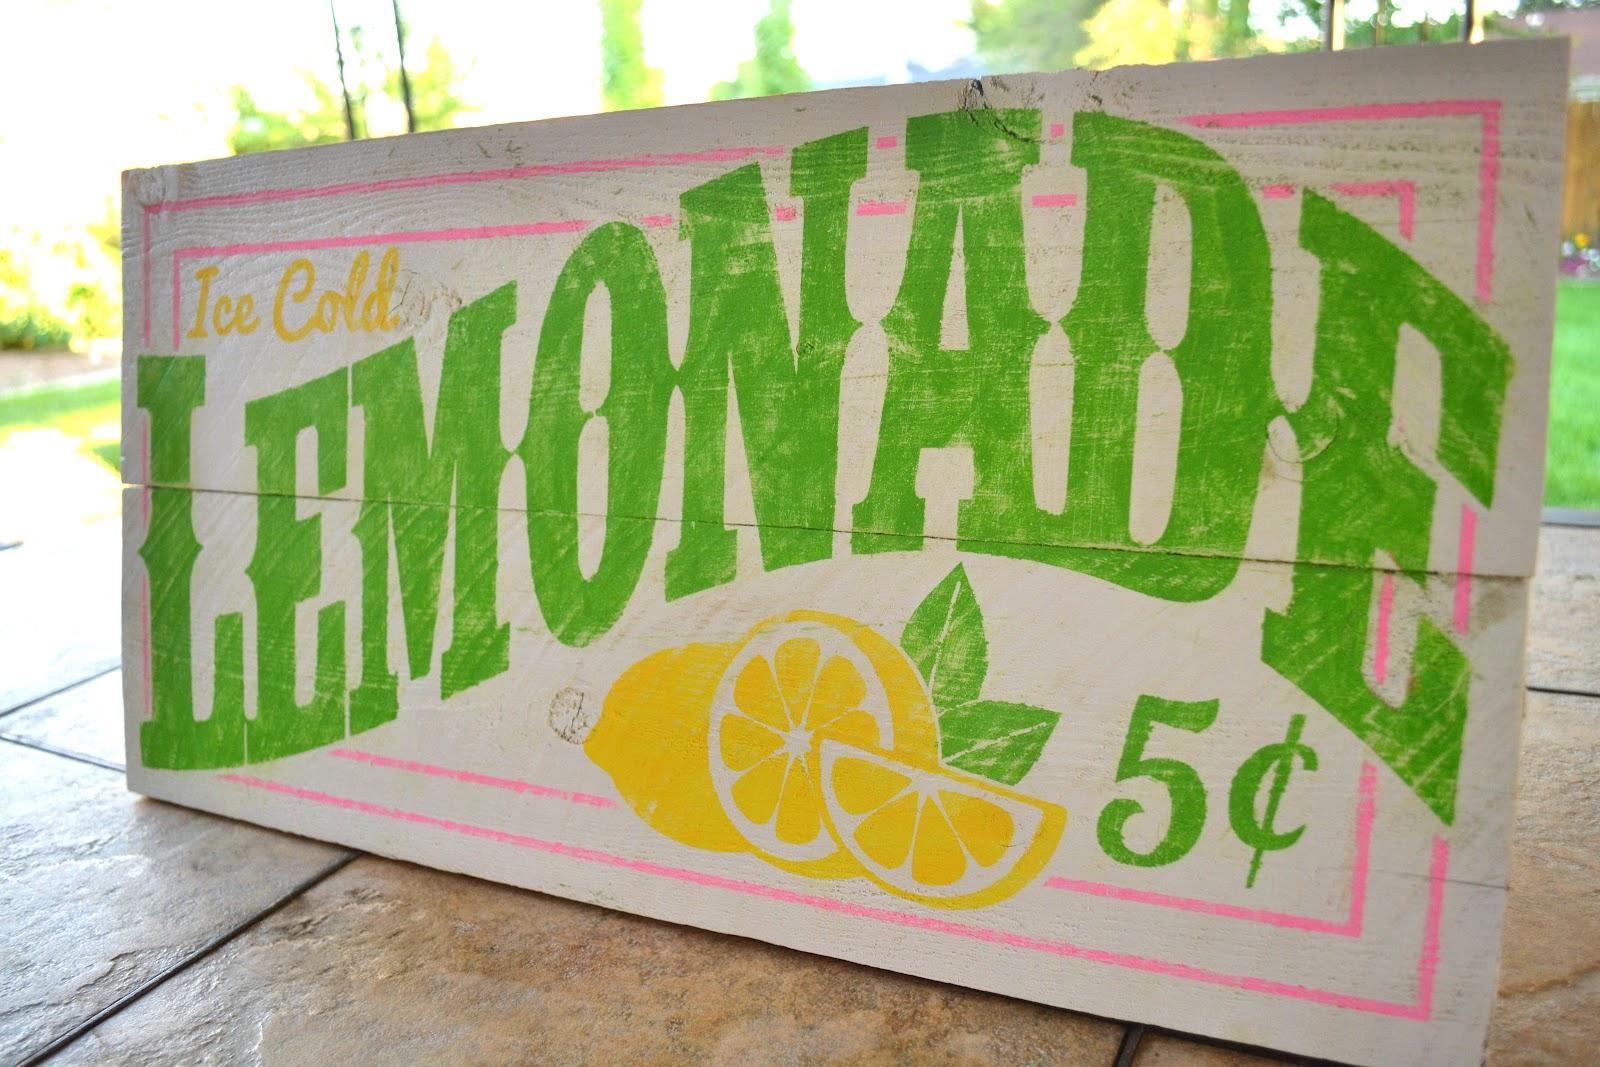 How Do You Make Old Fashioned Lemonade